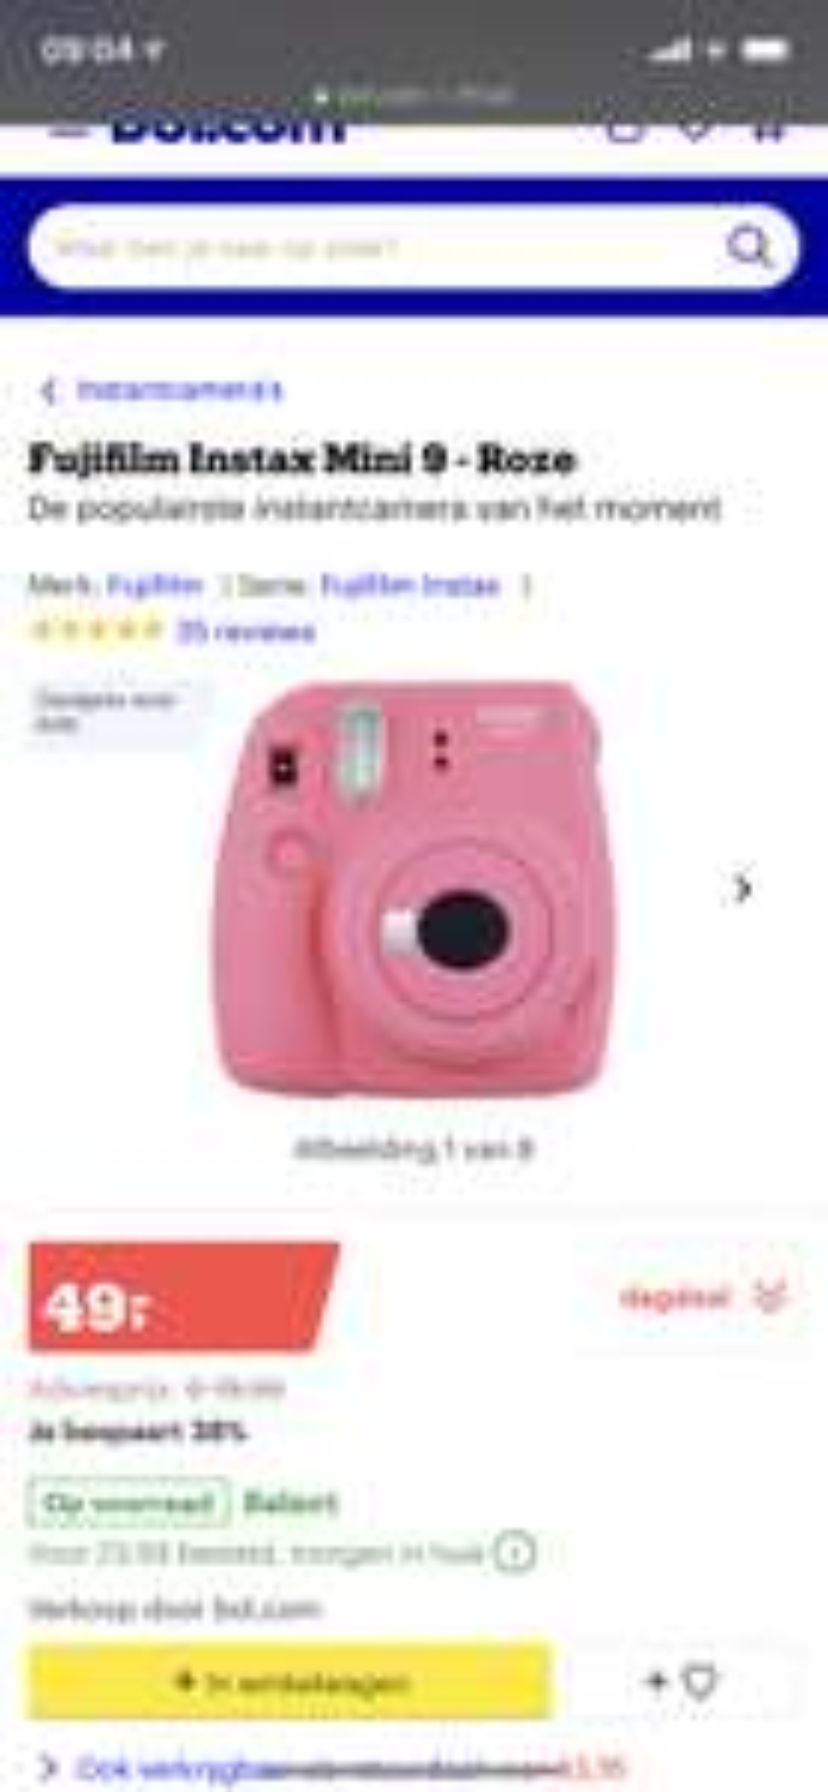 Fujifilm Instax Mini 9 voor €49